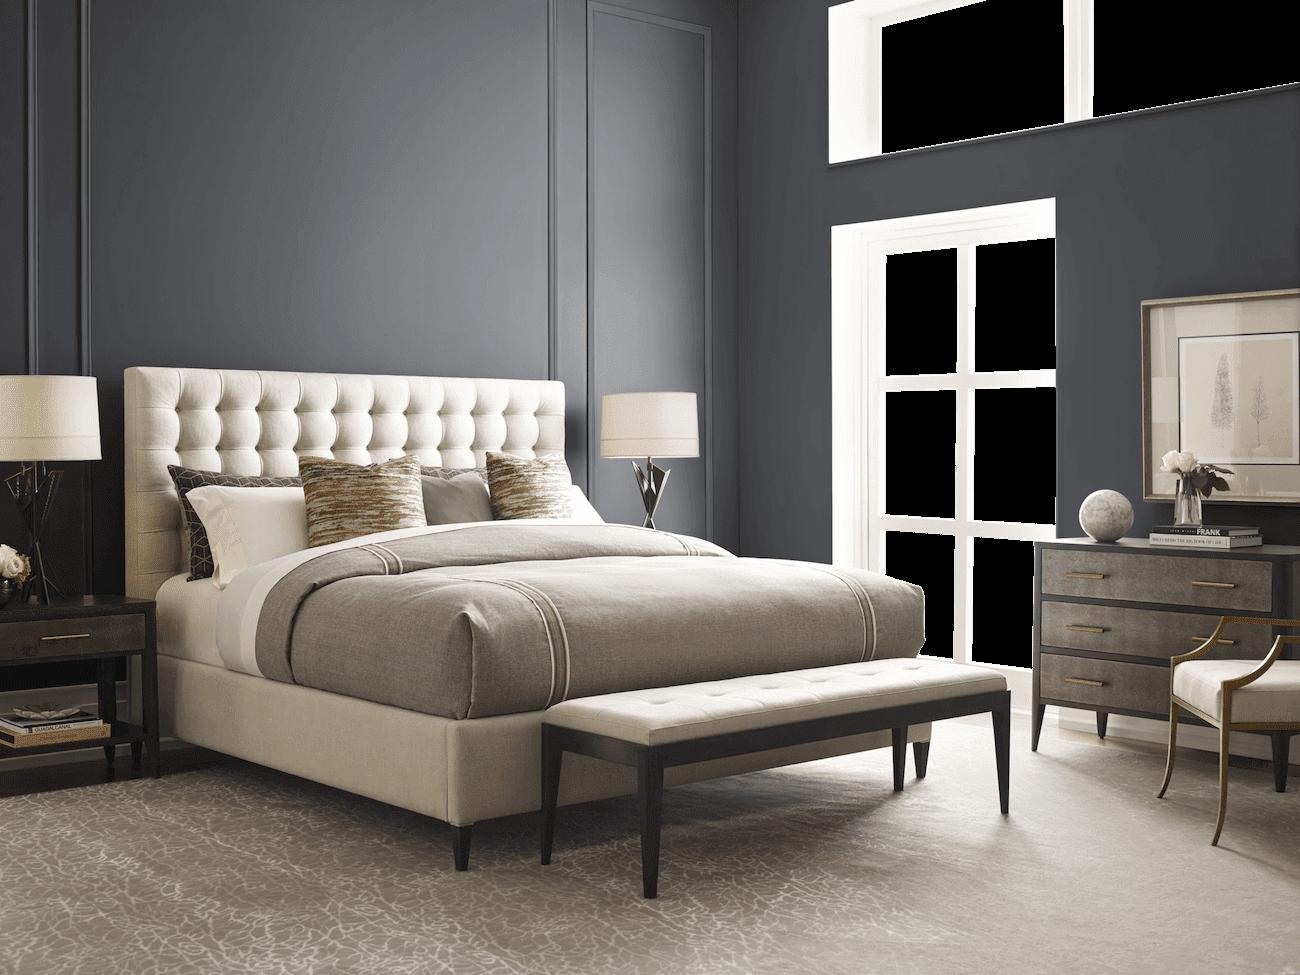 Bedroom-Theodore-Alexander-Studio-UrbanModern